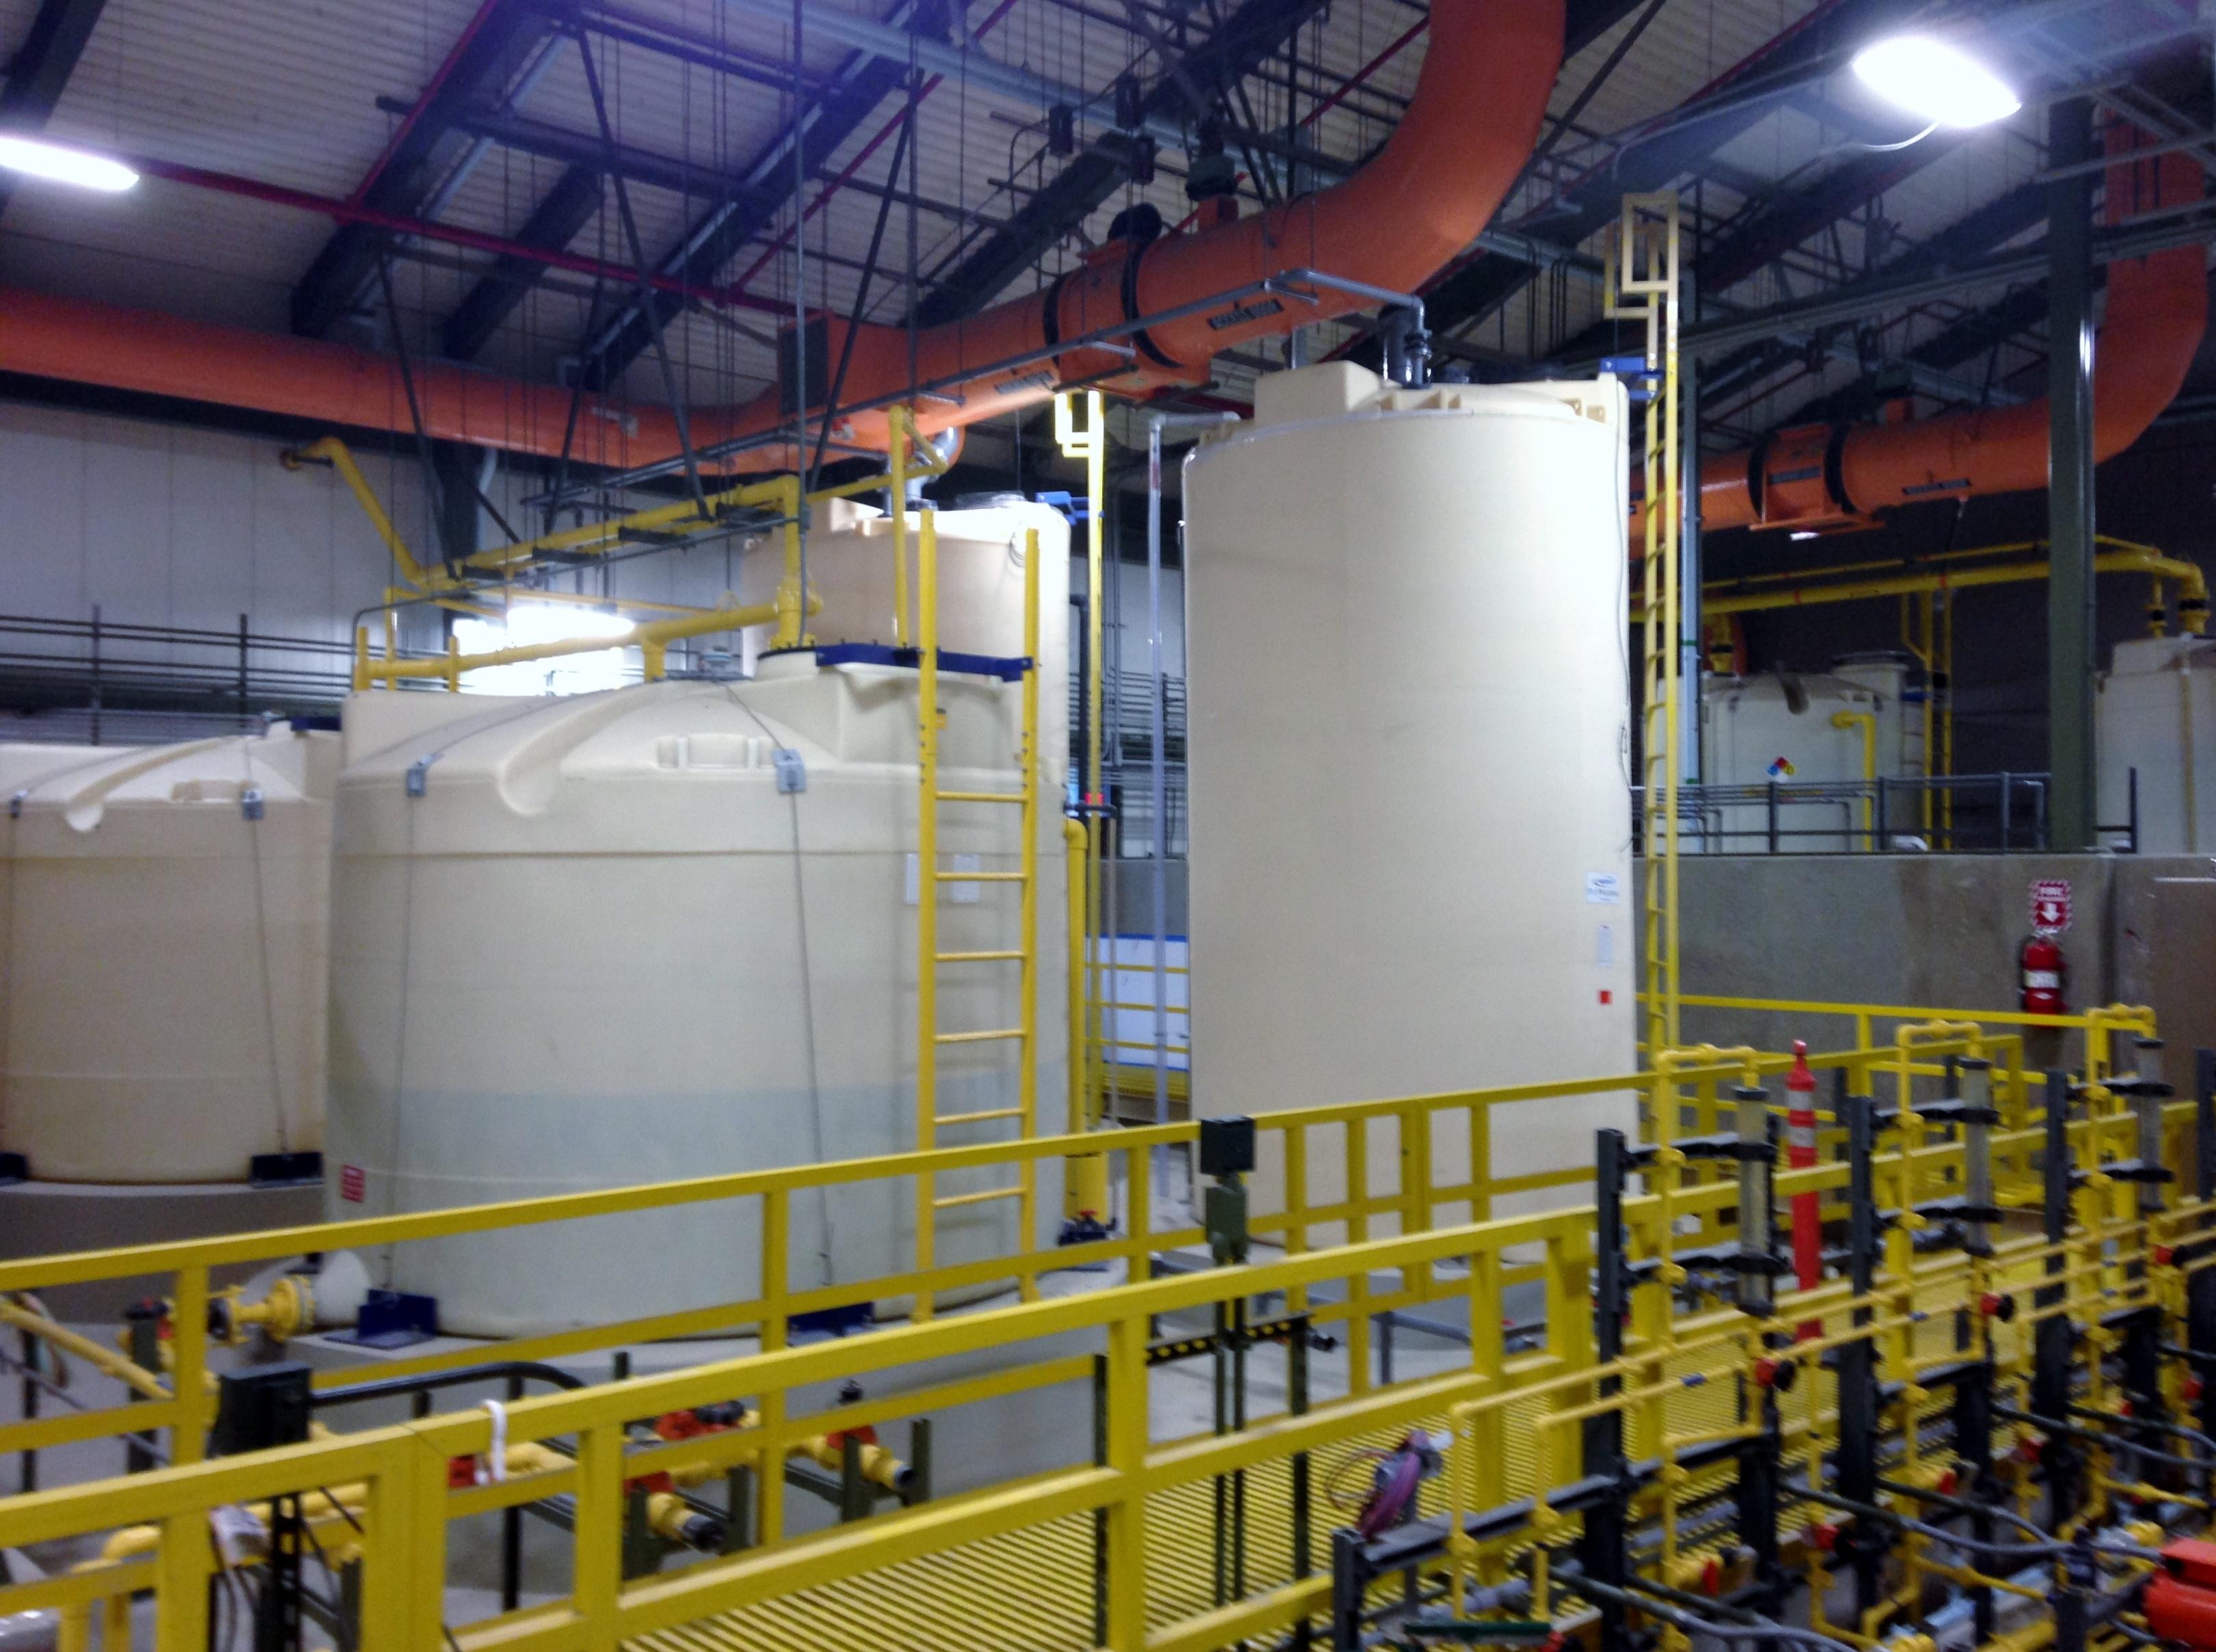 New_Water_Treatment_Plant_in_Washington_4.jpg